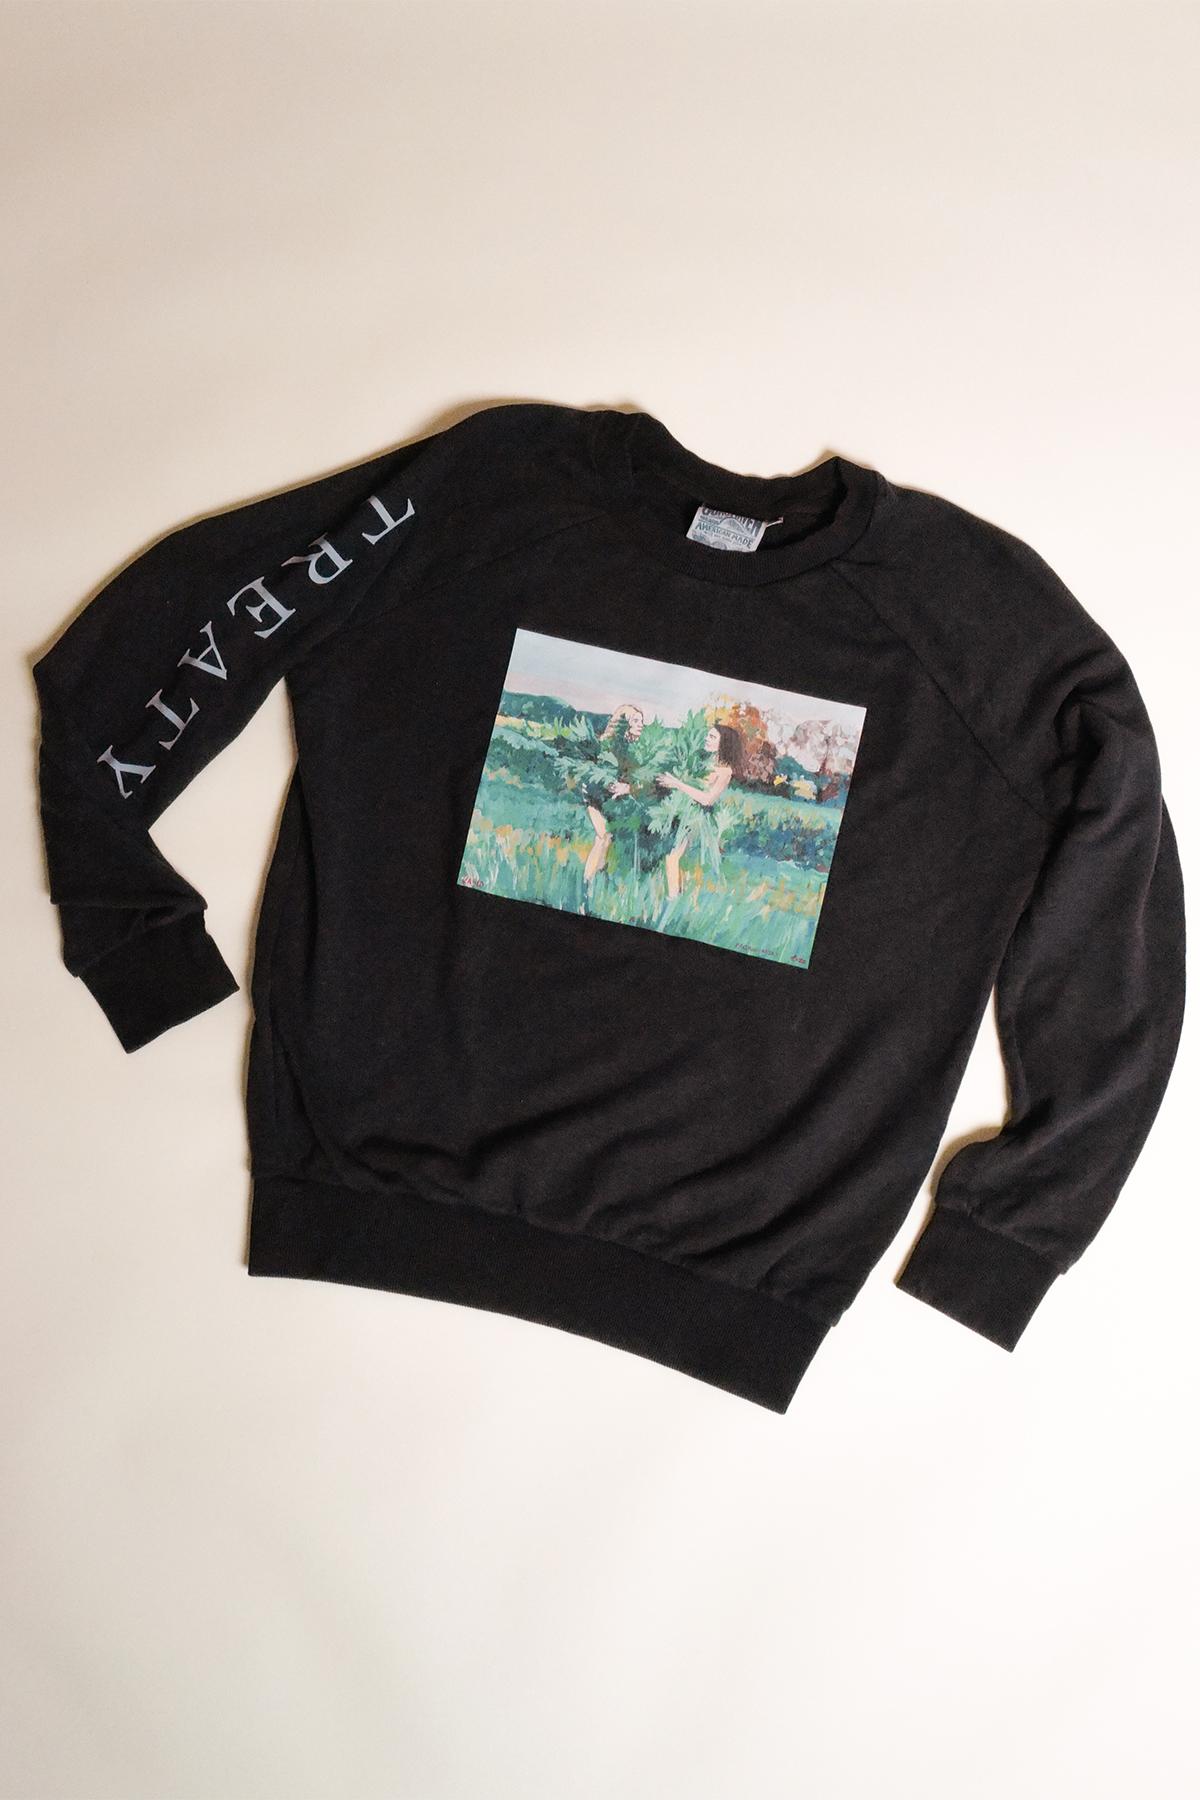 Allyship Sweatshirt grid image